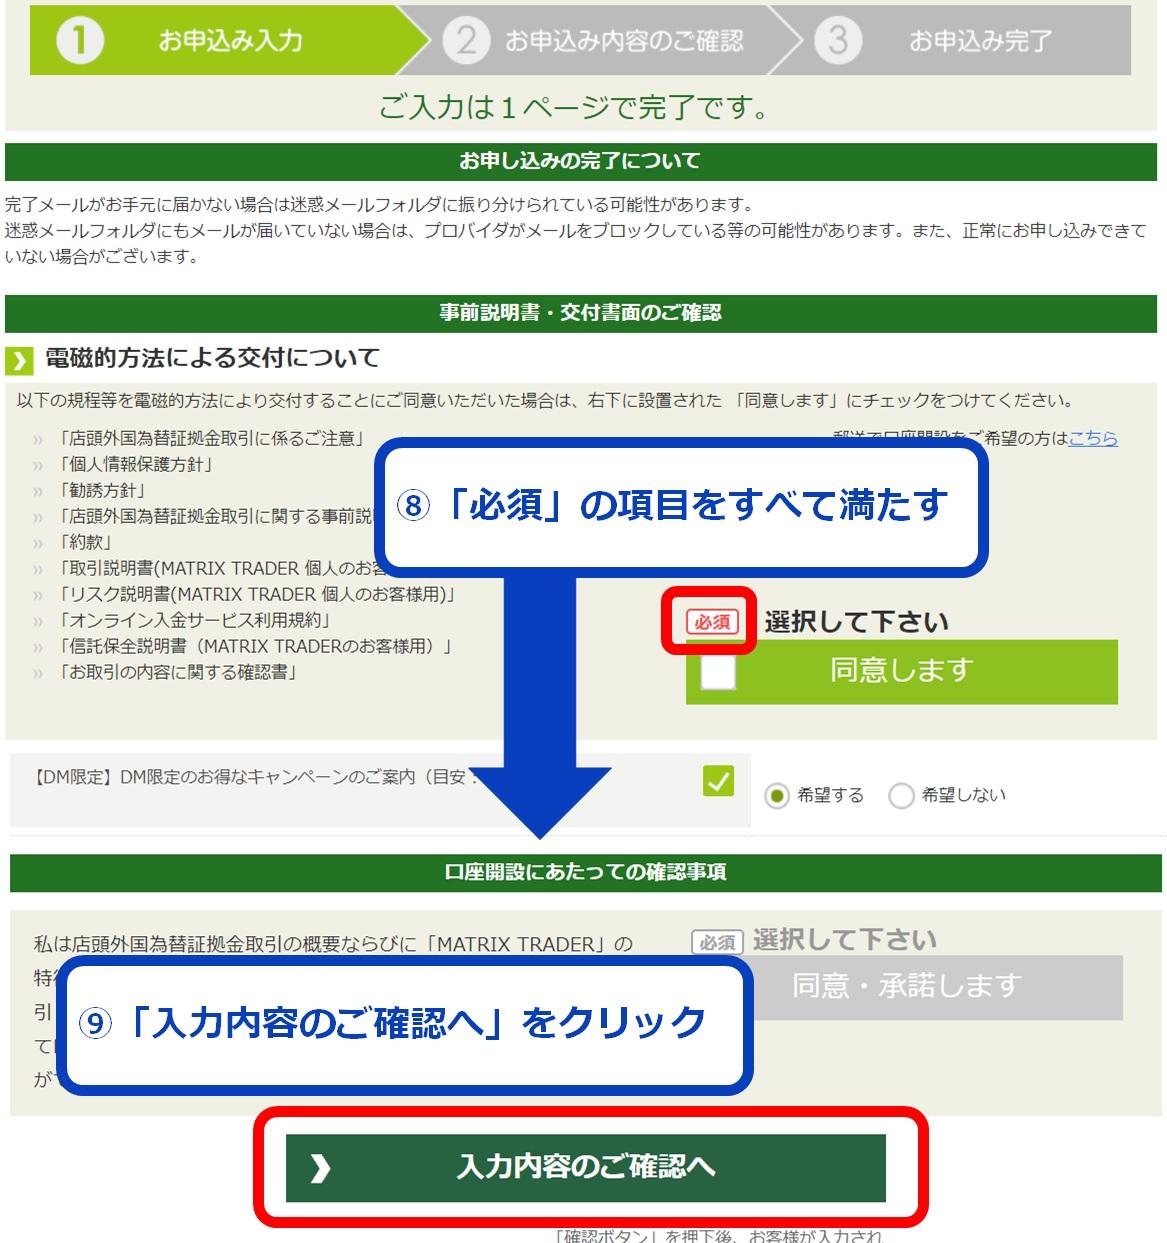 【JFX&ハピタスのキャンペーンで二重取り】JFXに無料登録する方法⑧~⑨「お申込み入力」画面で必須項目を満たしていくのイメージ画像